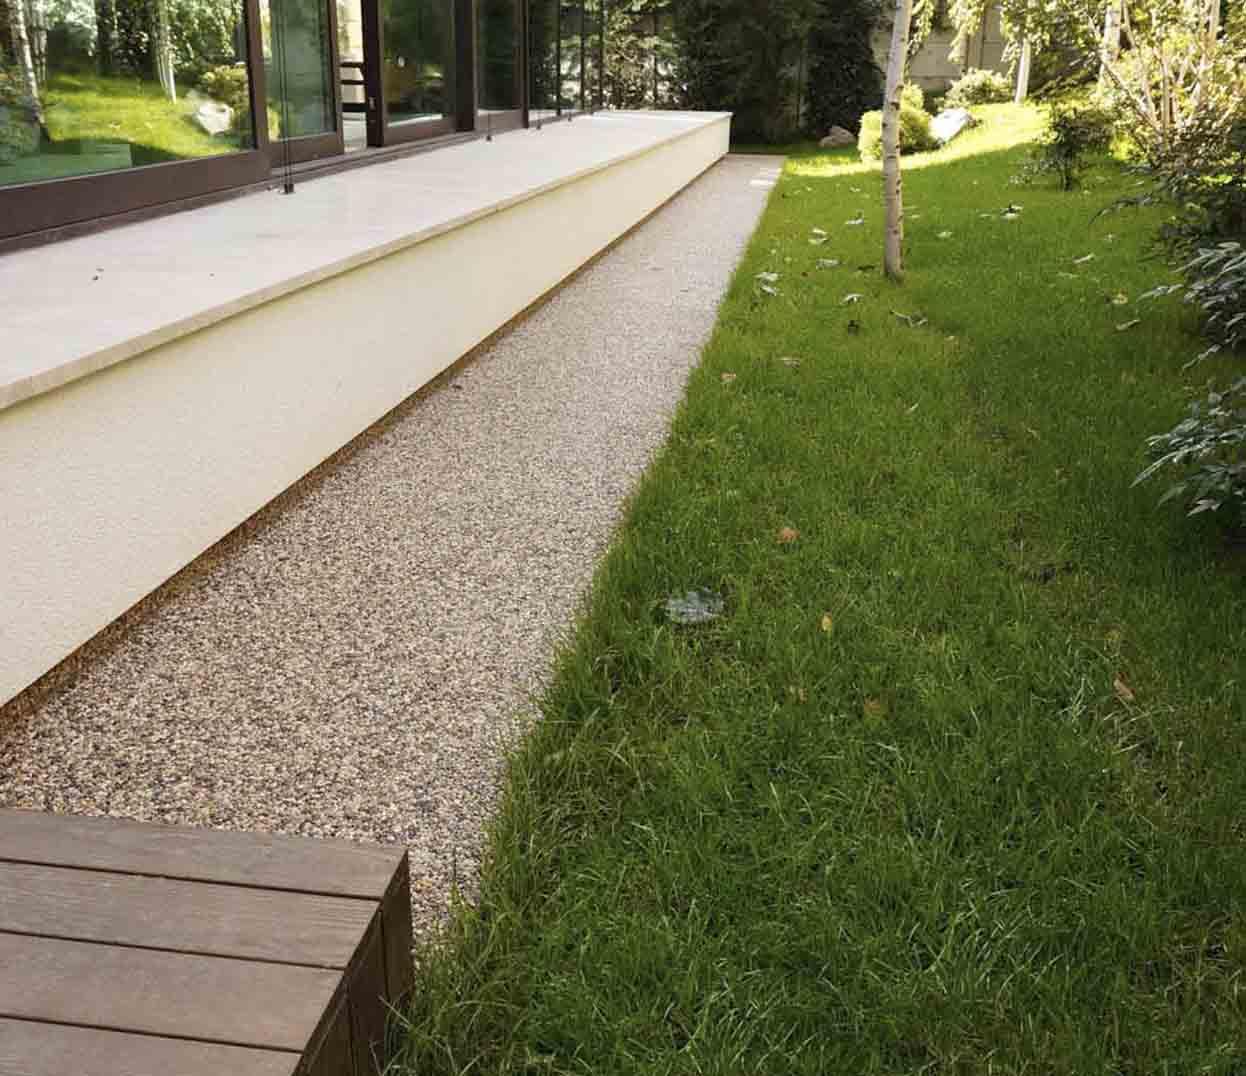 viarustik-stone-carpet 6